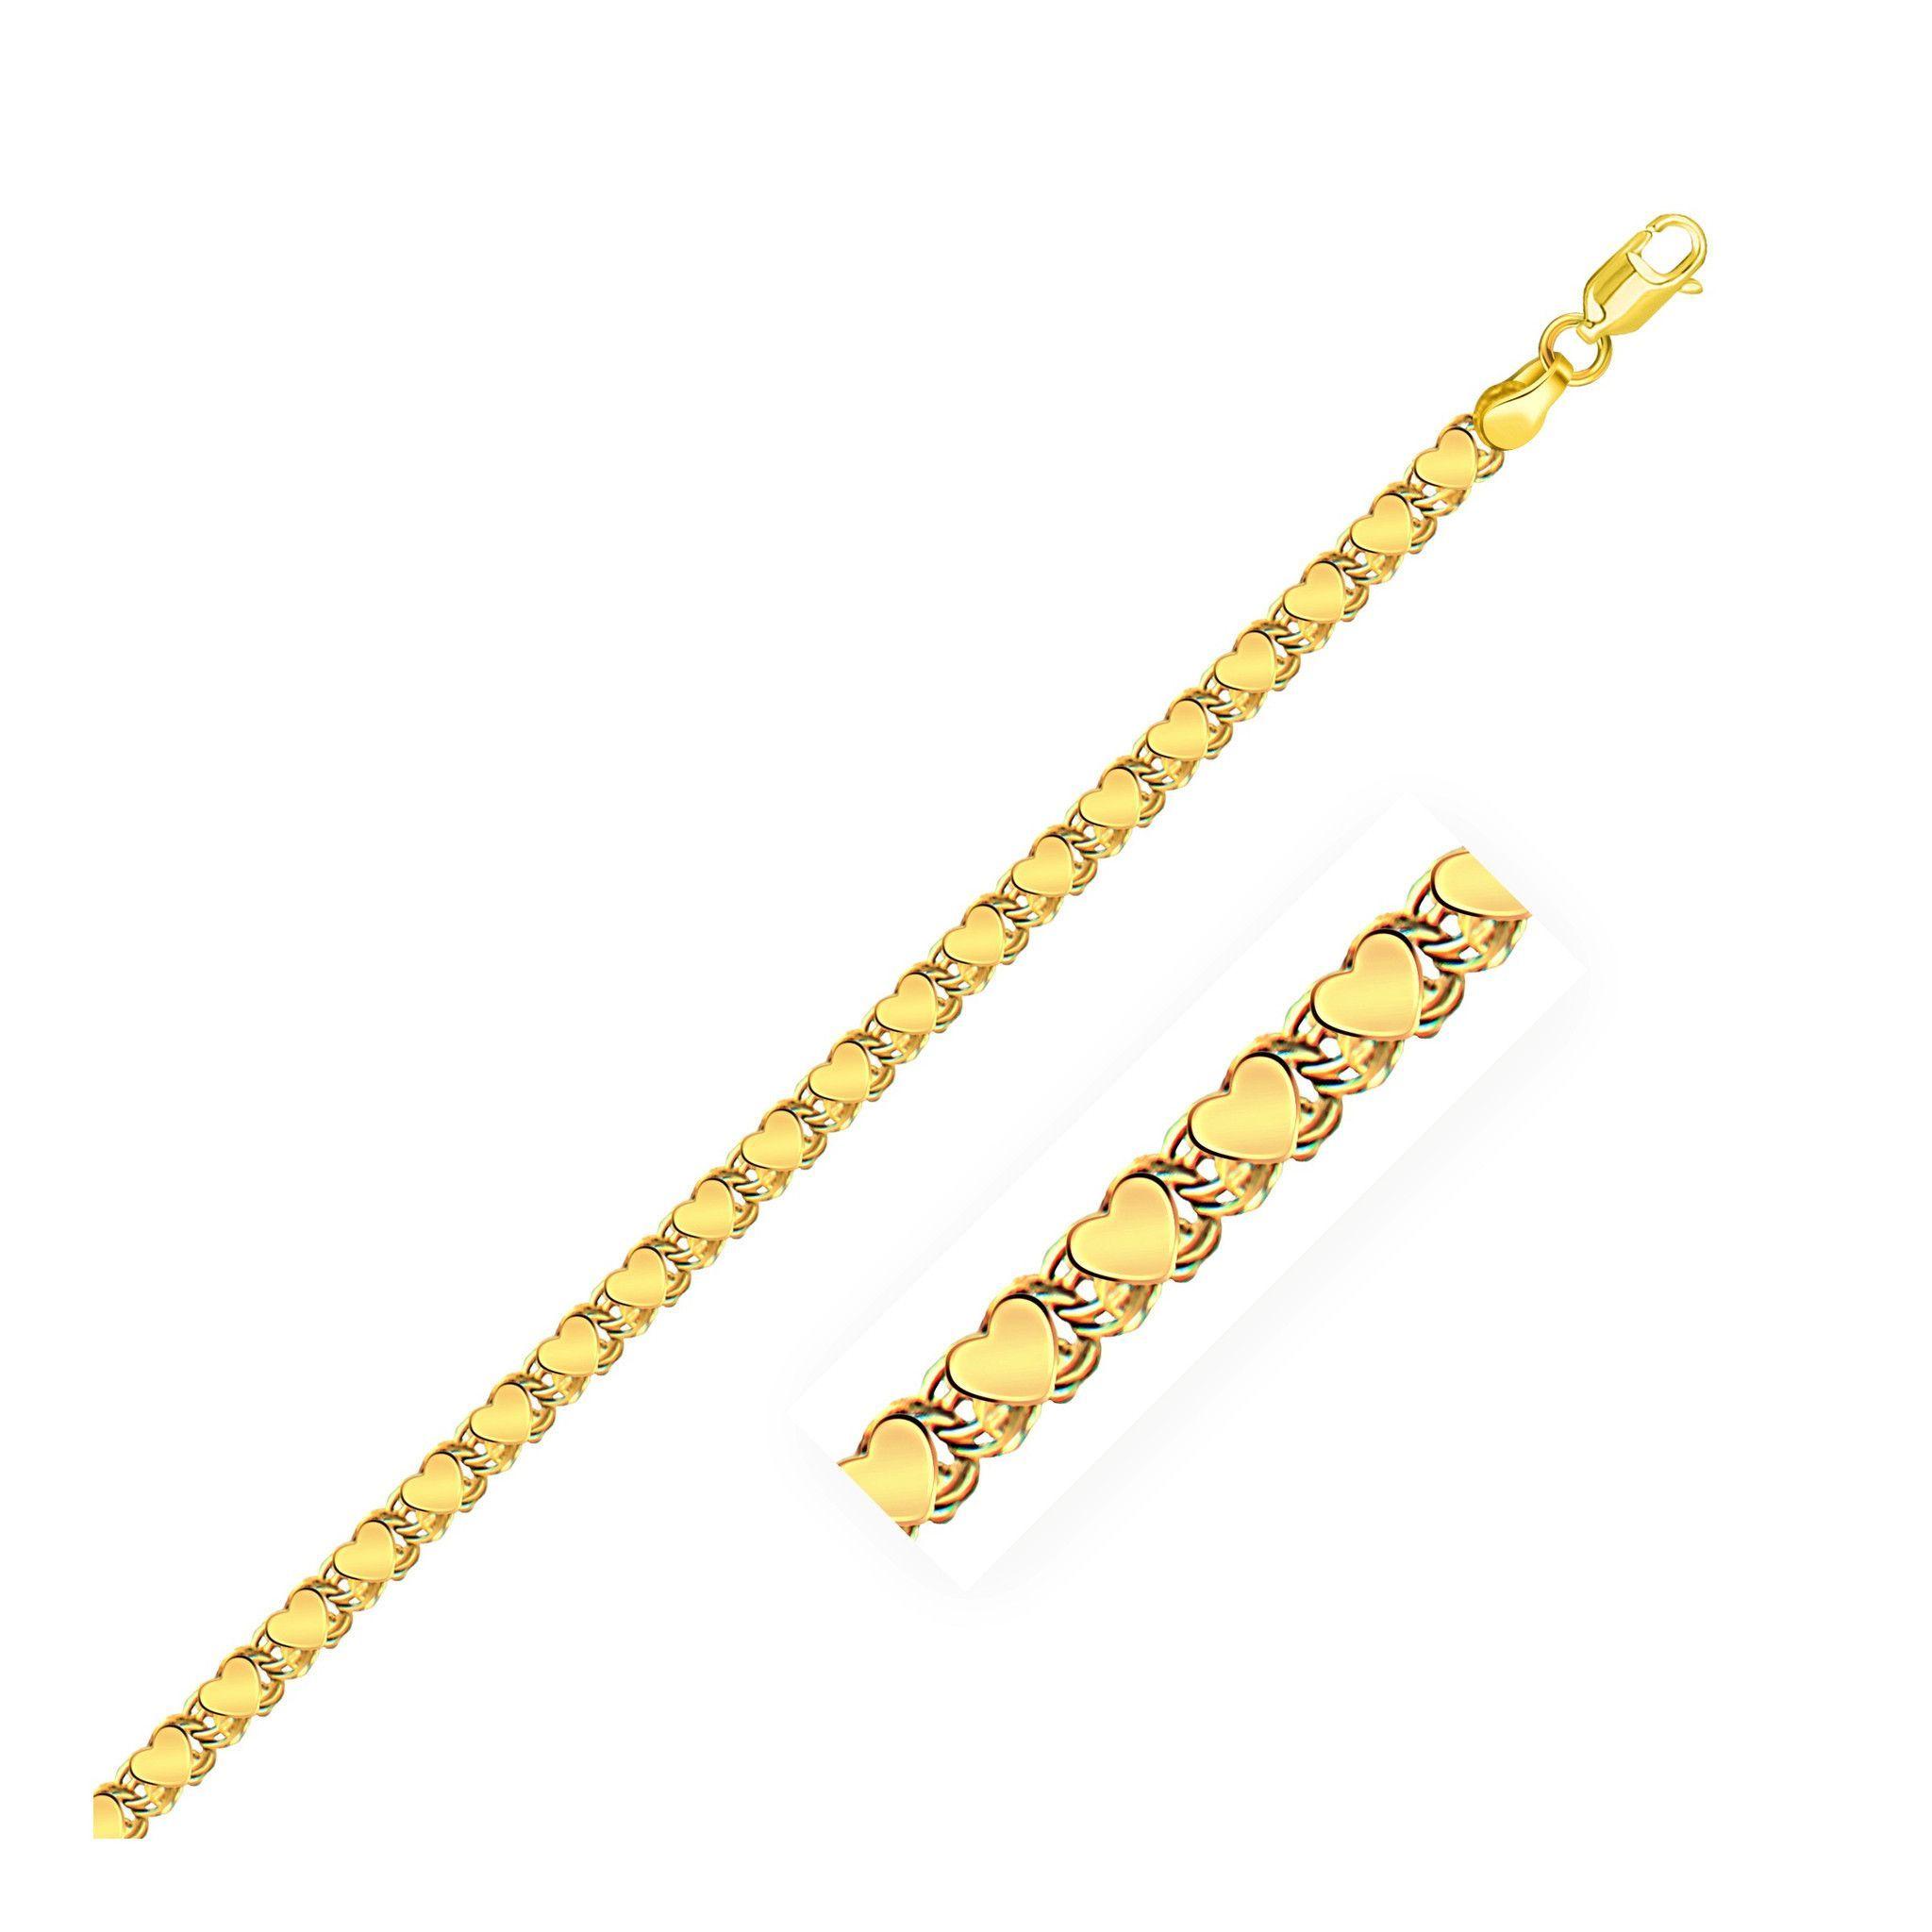 3.3mm 14K Yellow Gold Heart Bracelet